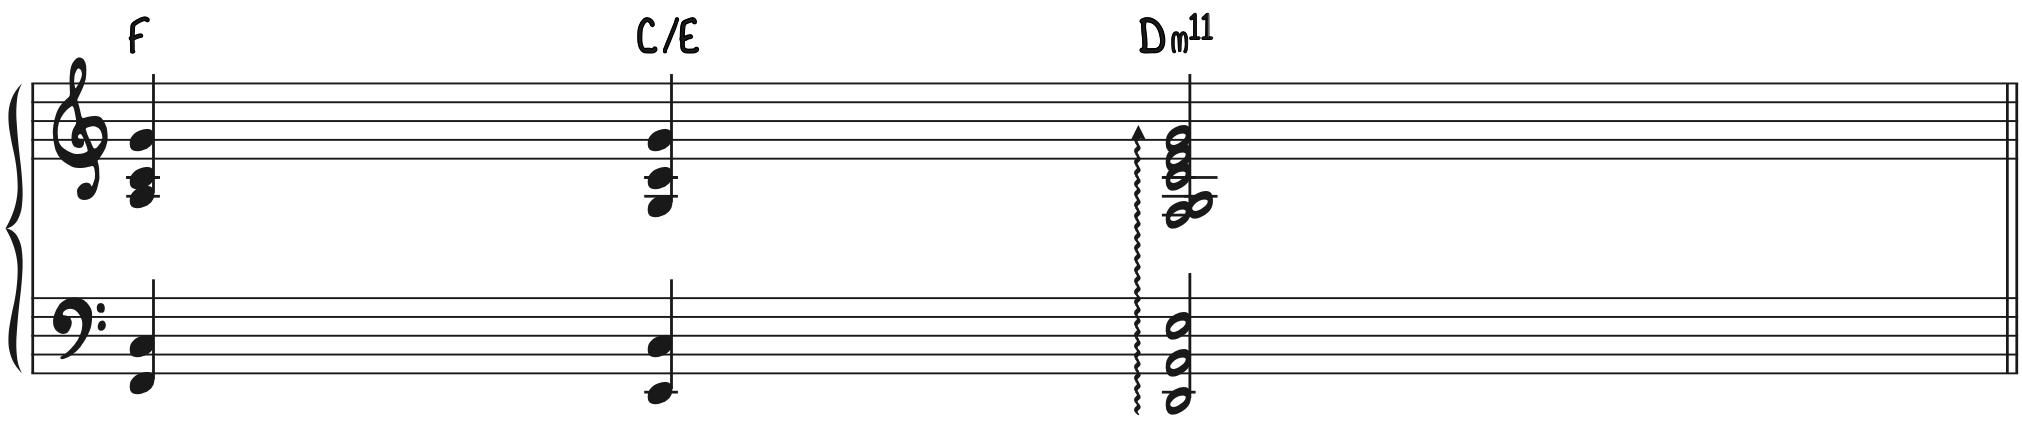 Progression 2 - Transformed Beautiful Minor 11 Chord Dm11